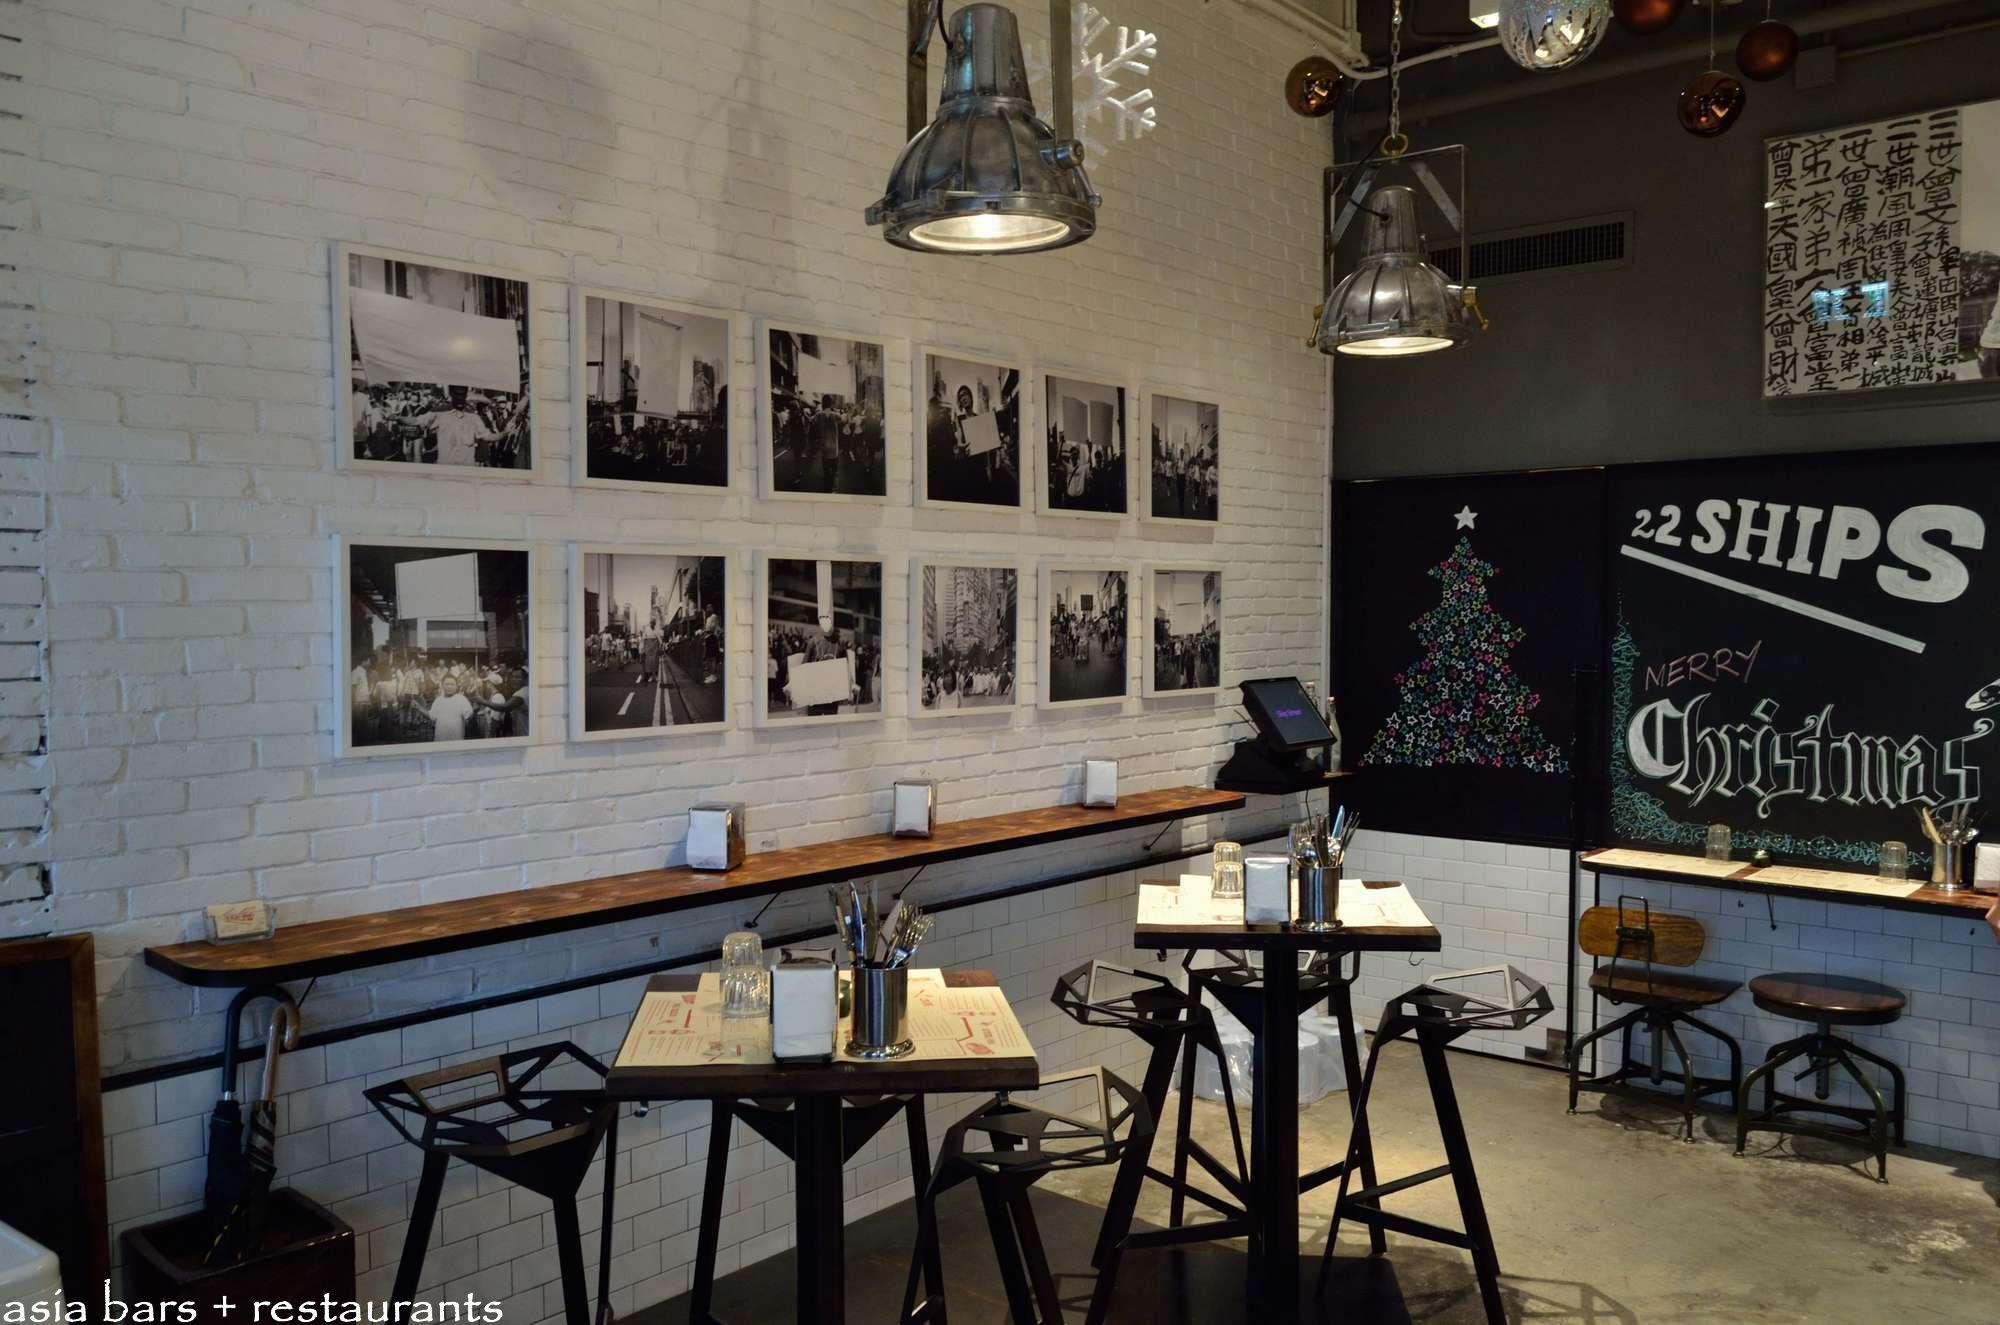 Industrial Chic Restaurants - Google Search